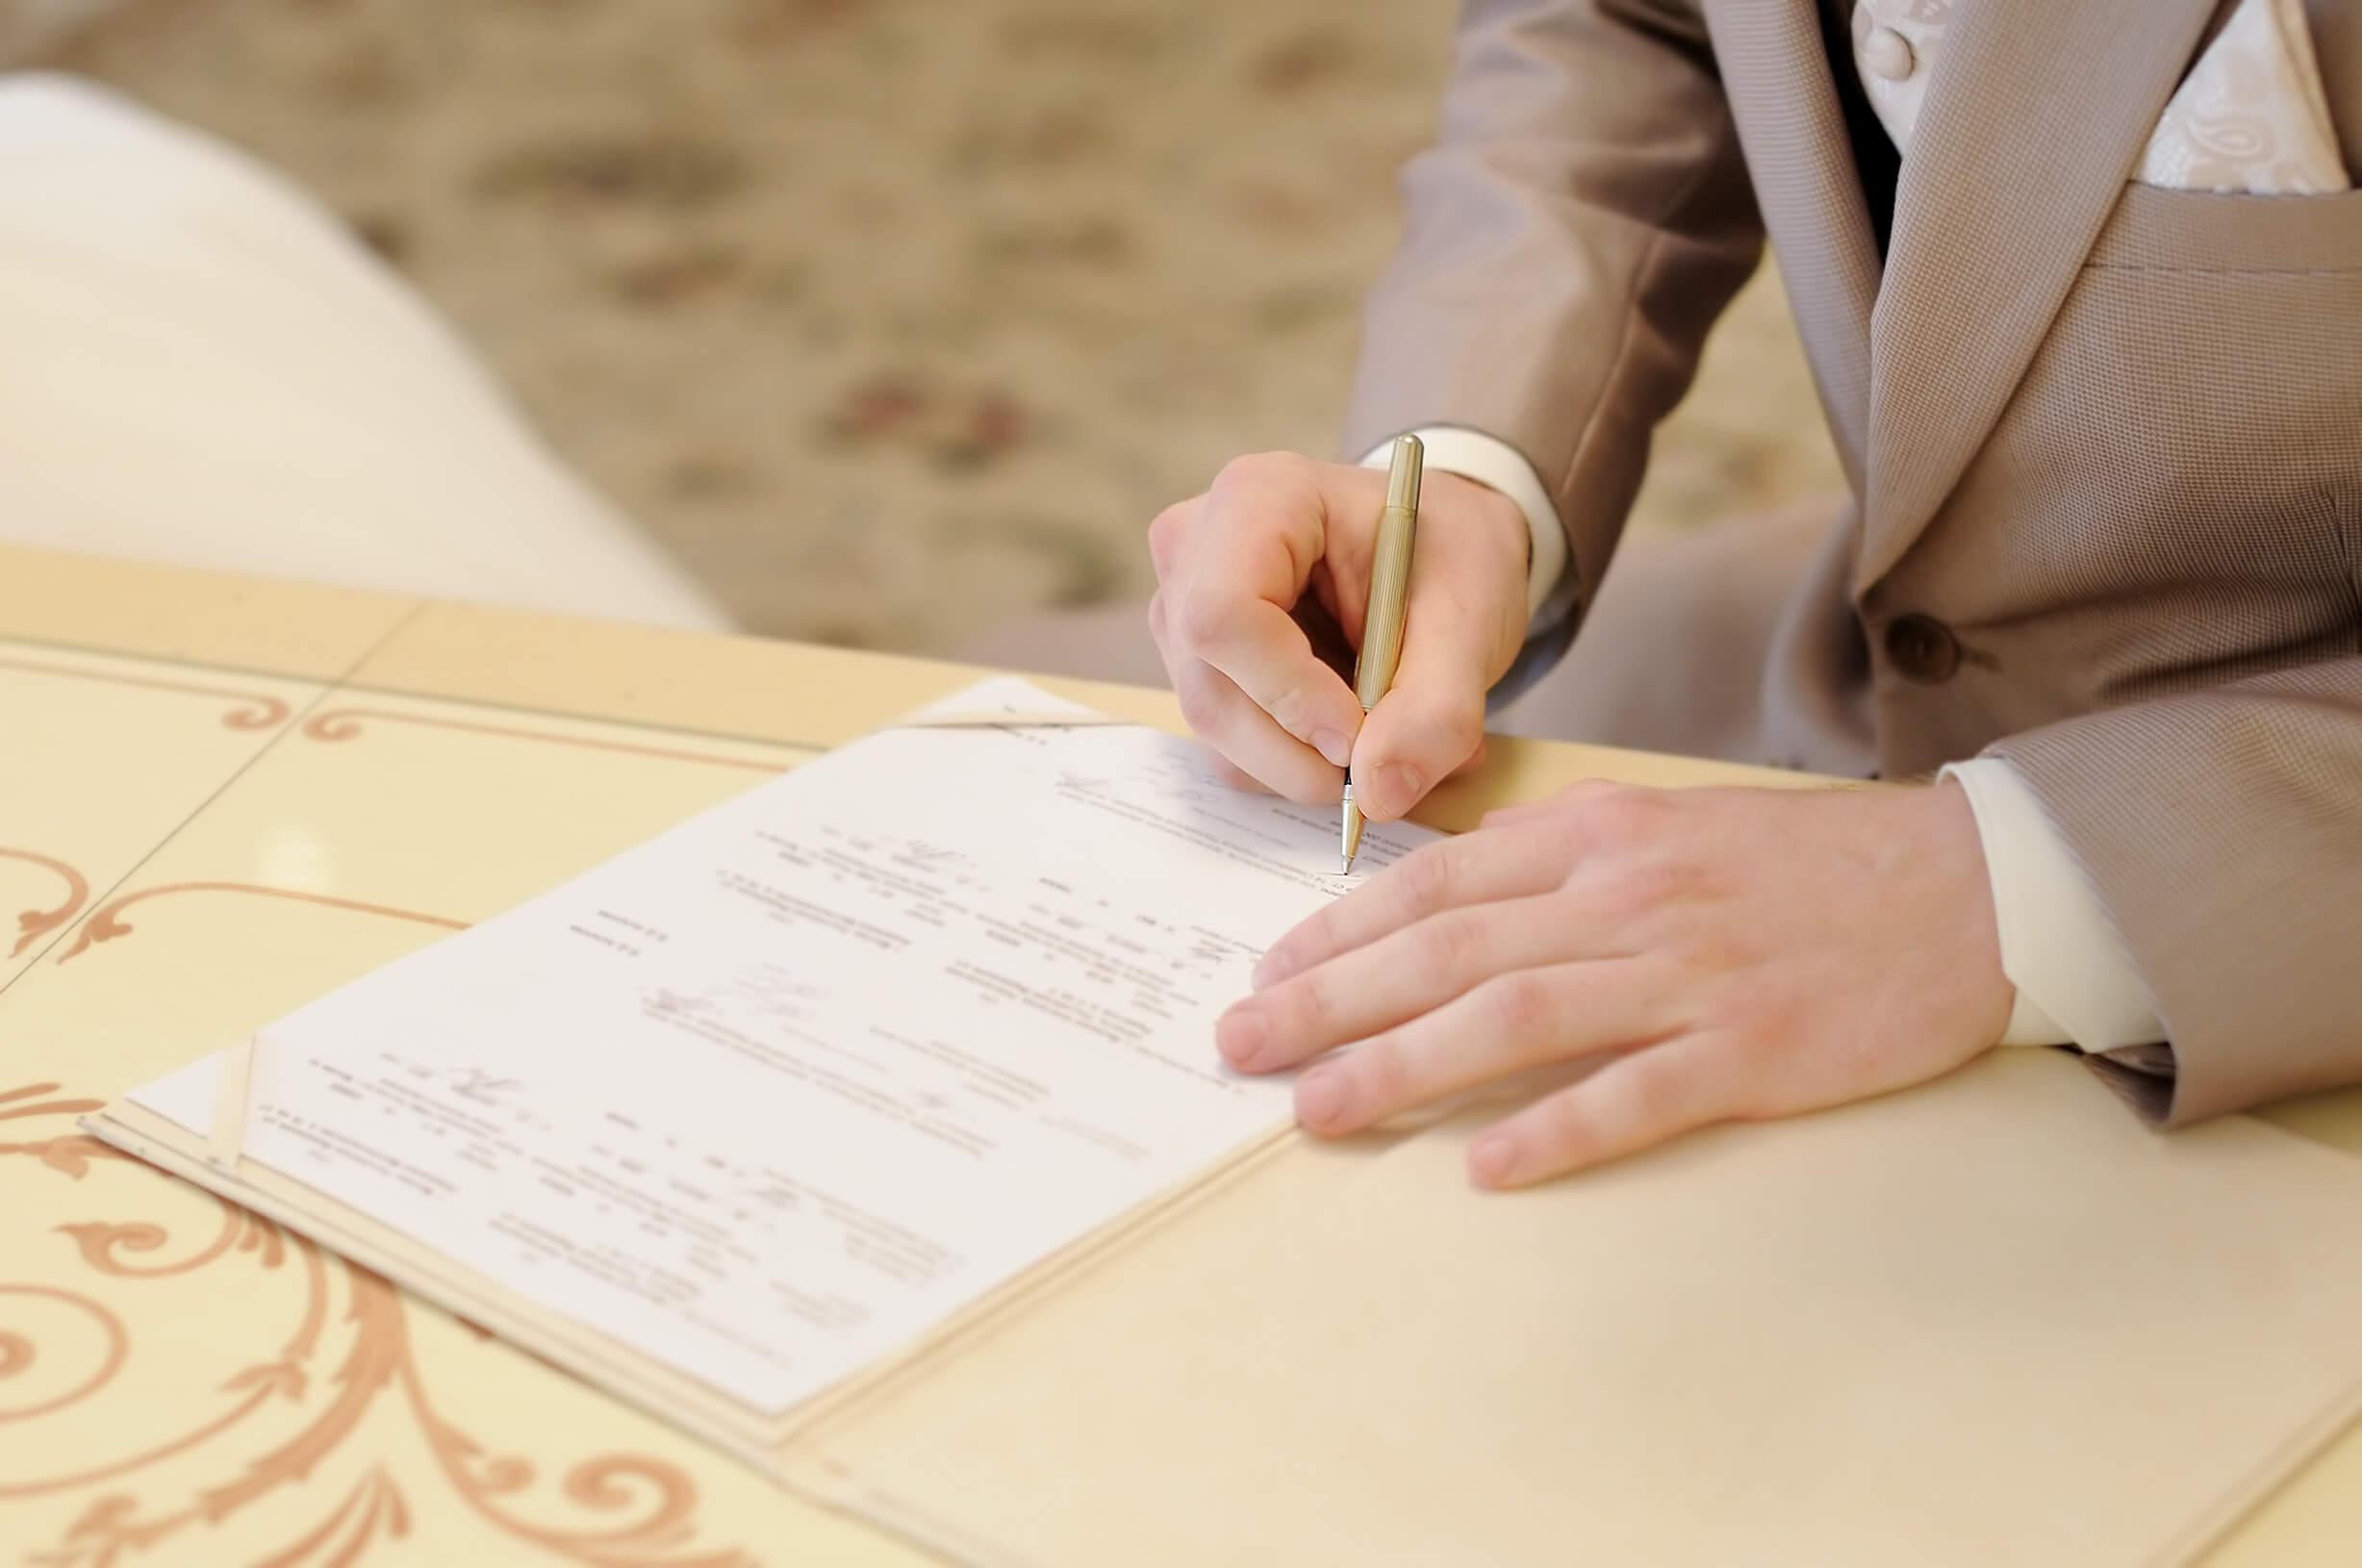 Для регистрации брака нужна ли прописка